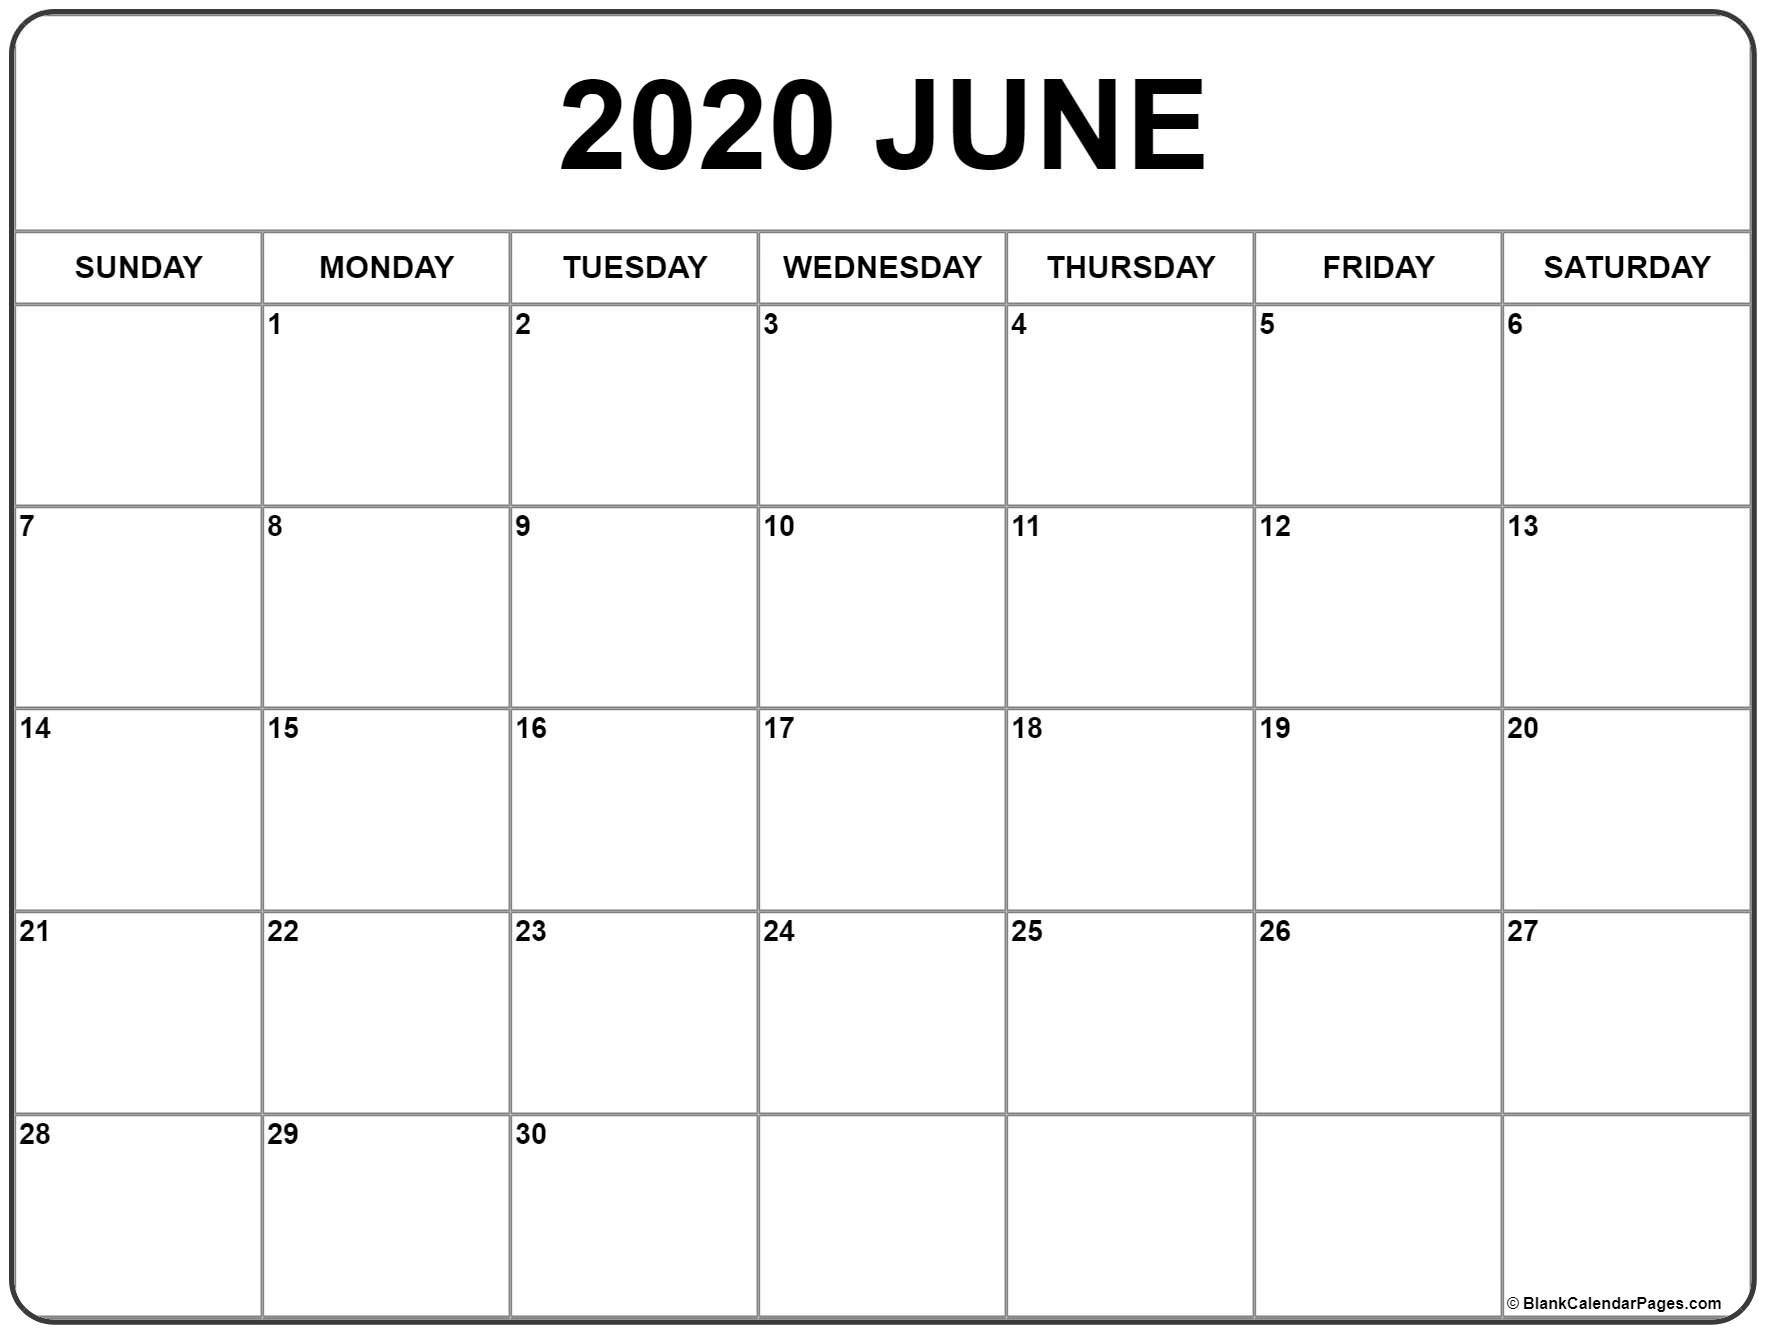 June 2020 Calendar | Free Printable Monthly Calendars Fre Fill In Online Calendars